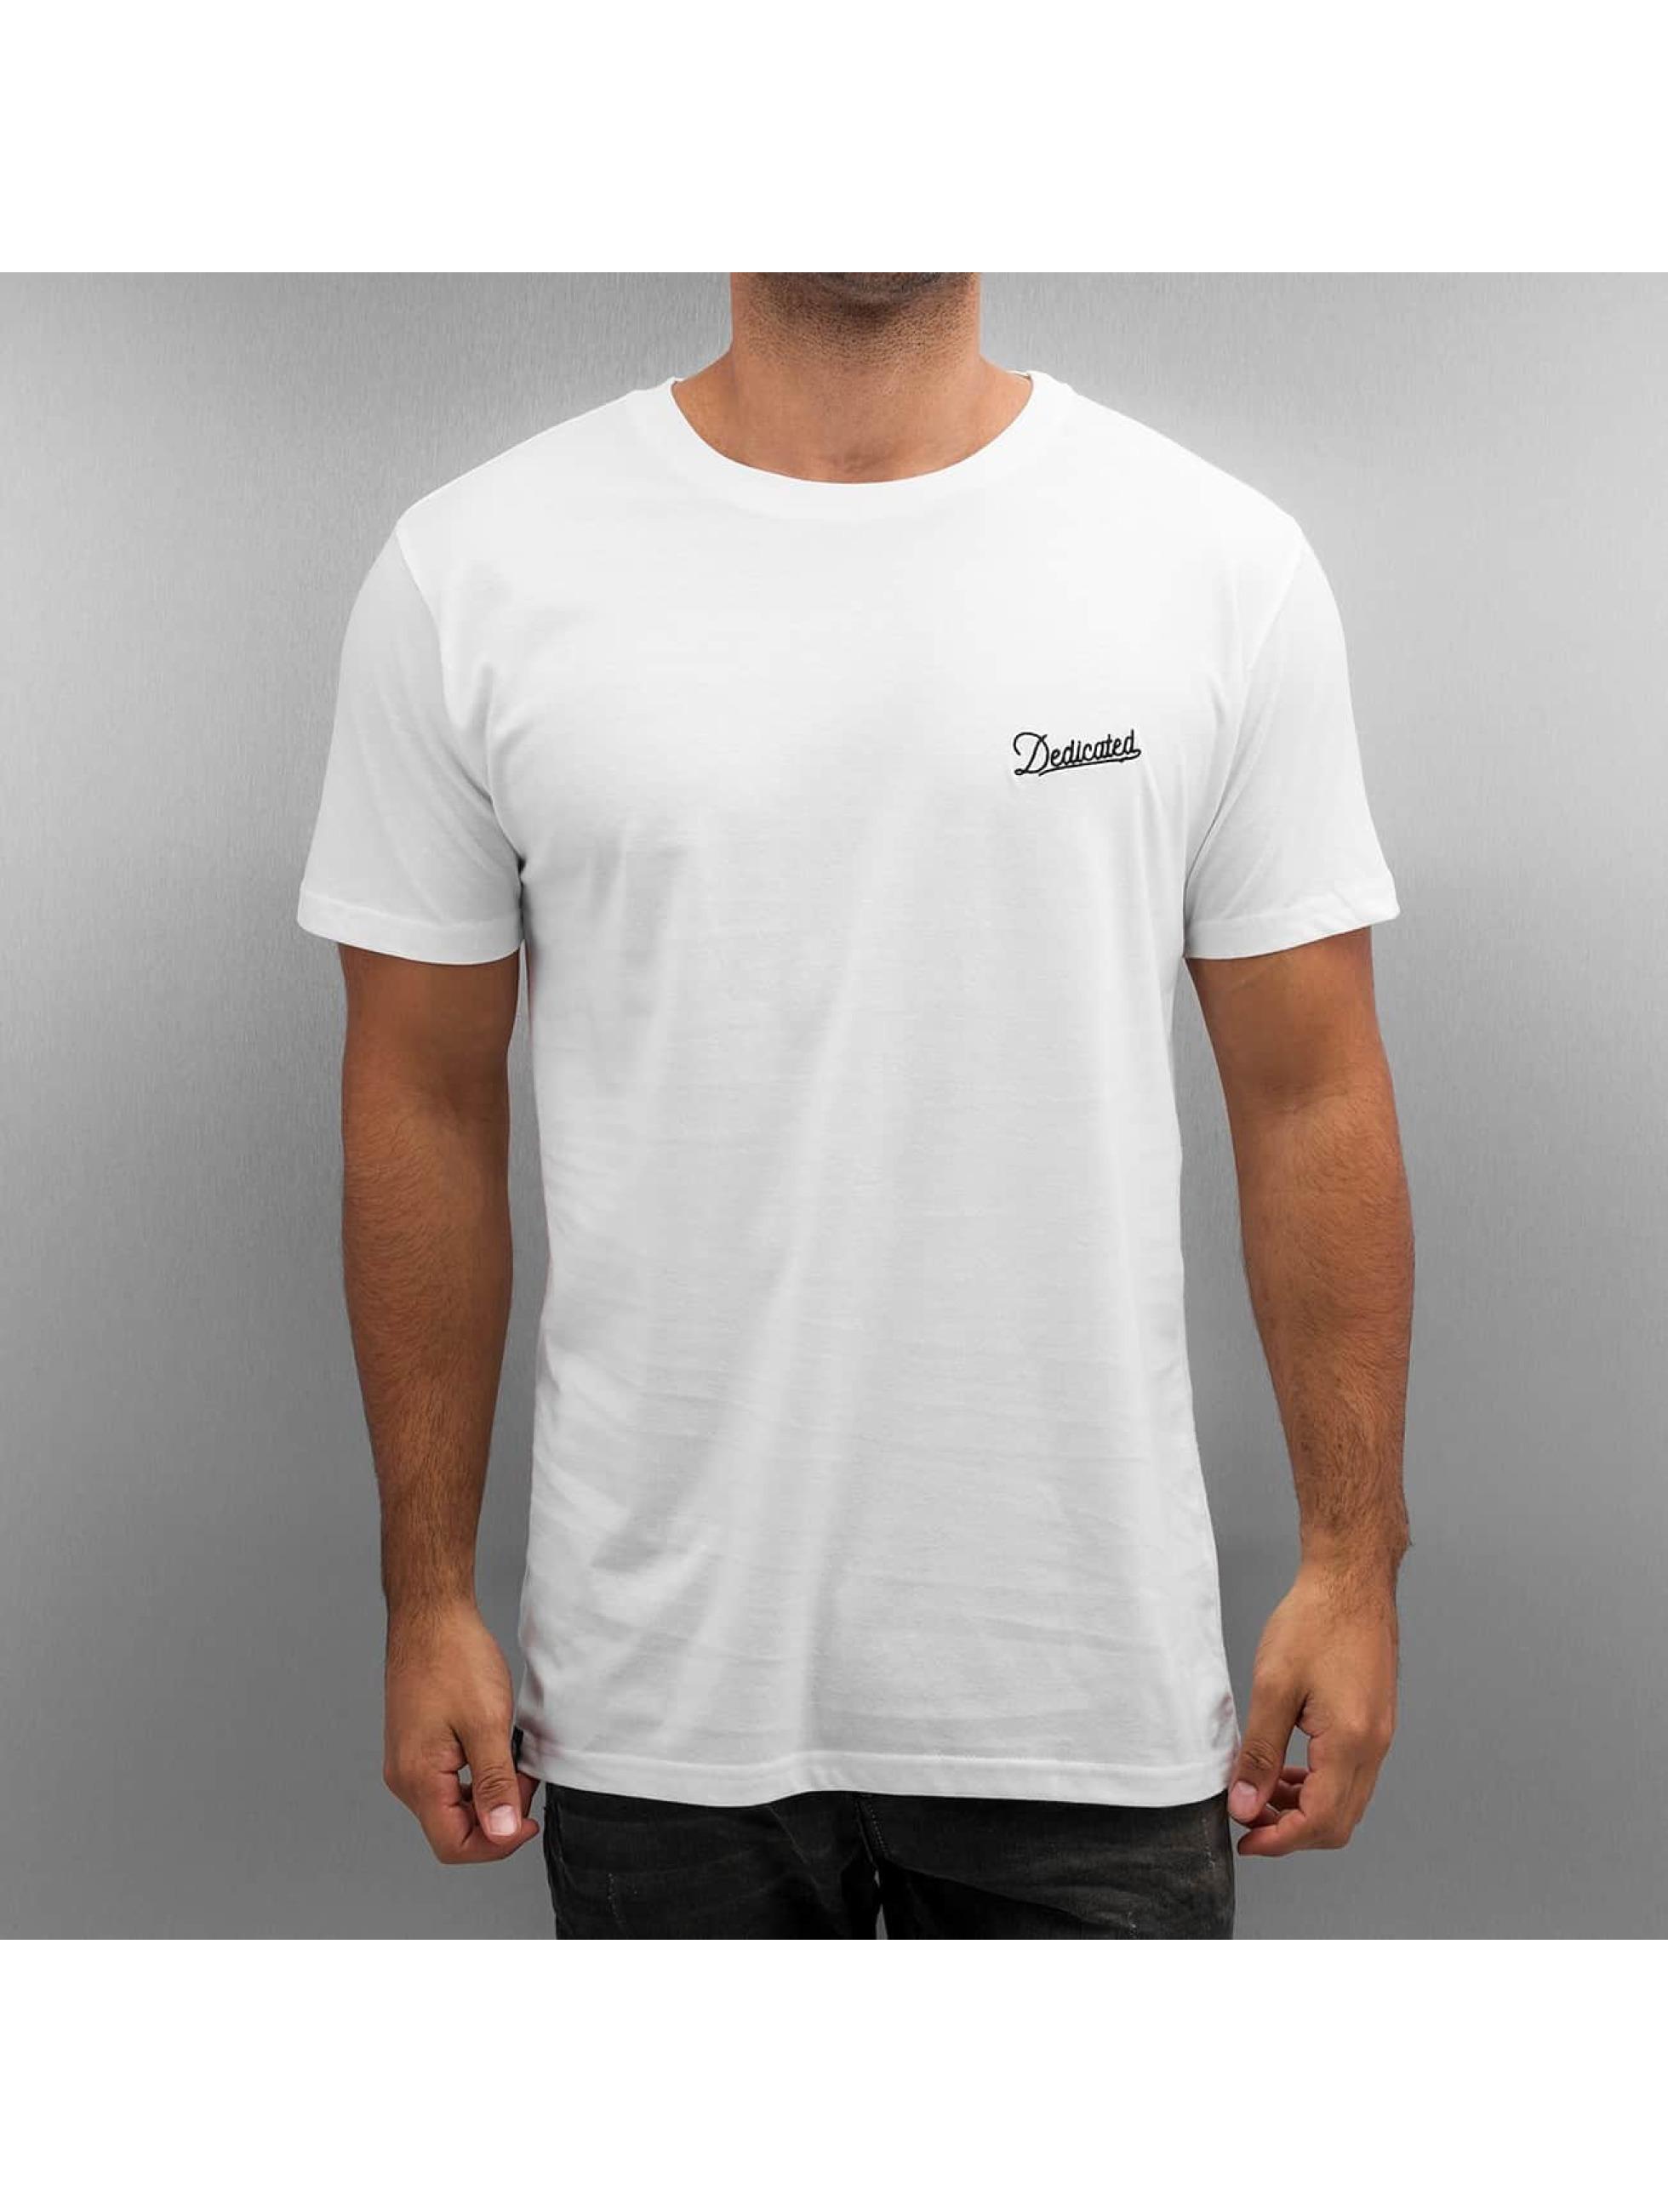 DEDICATED Männer T-Shirt Stockholm Mountain Script in weiß